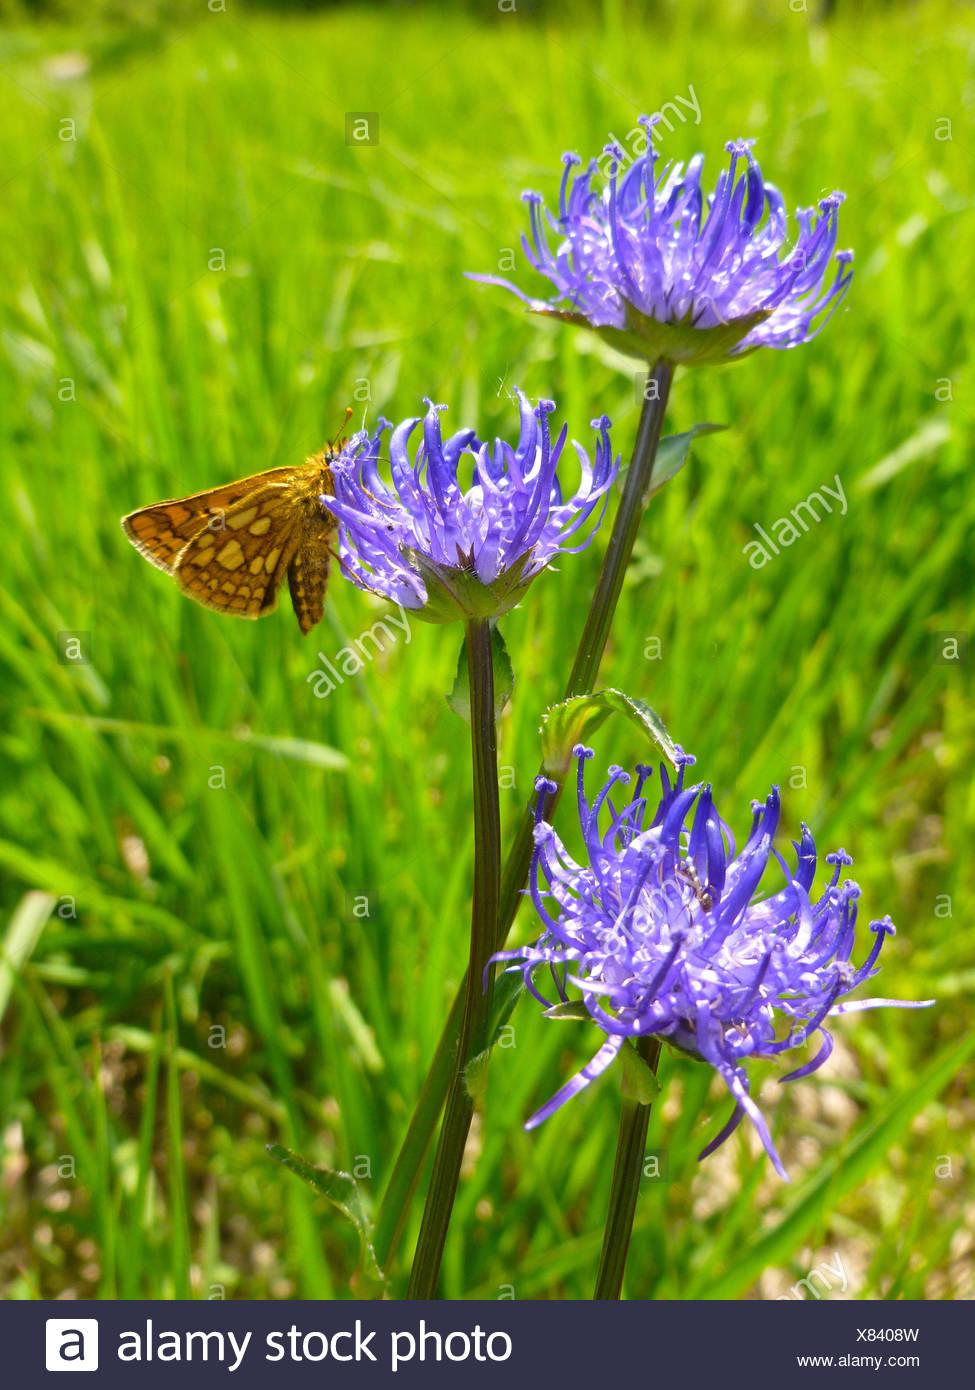 Germany, Upper Bavaria, Pupplinger meadow near Wolfratshausen - Stock Image